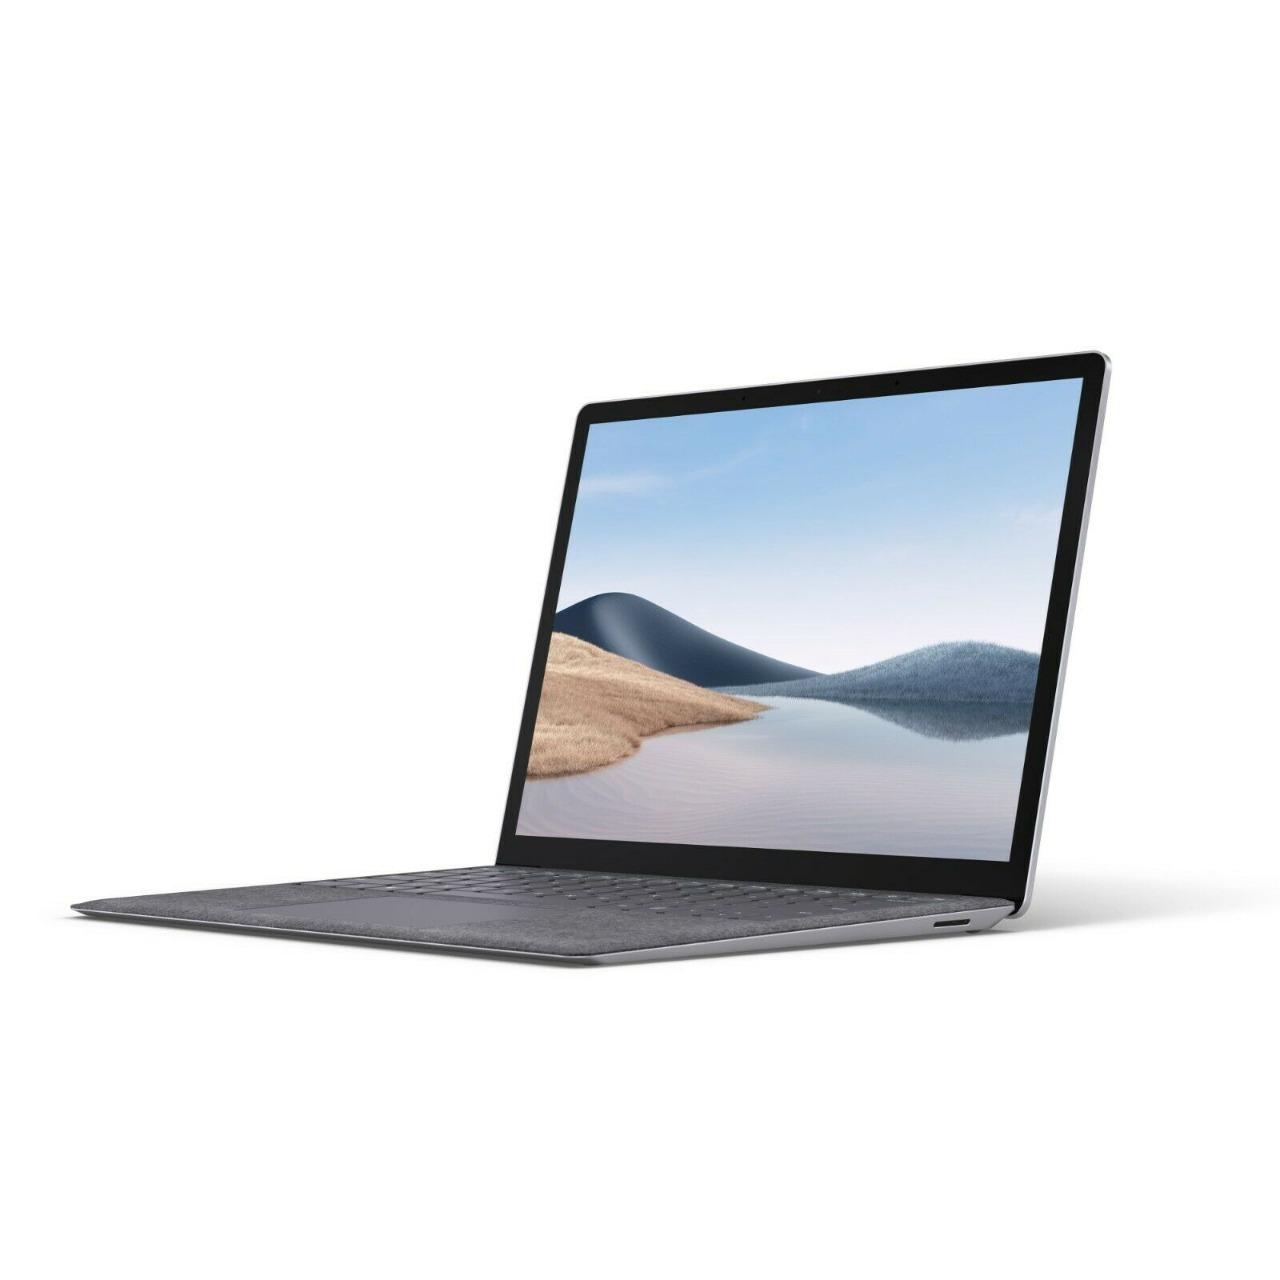 Microsoft Surface laptop 4 core i5 8gb 512gb Platinum